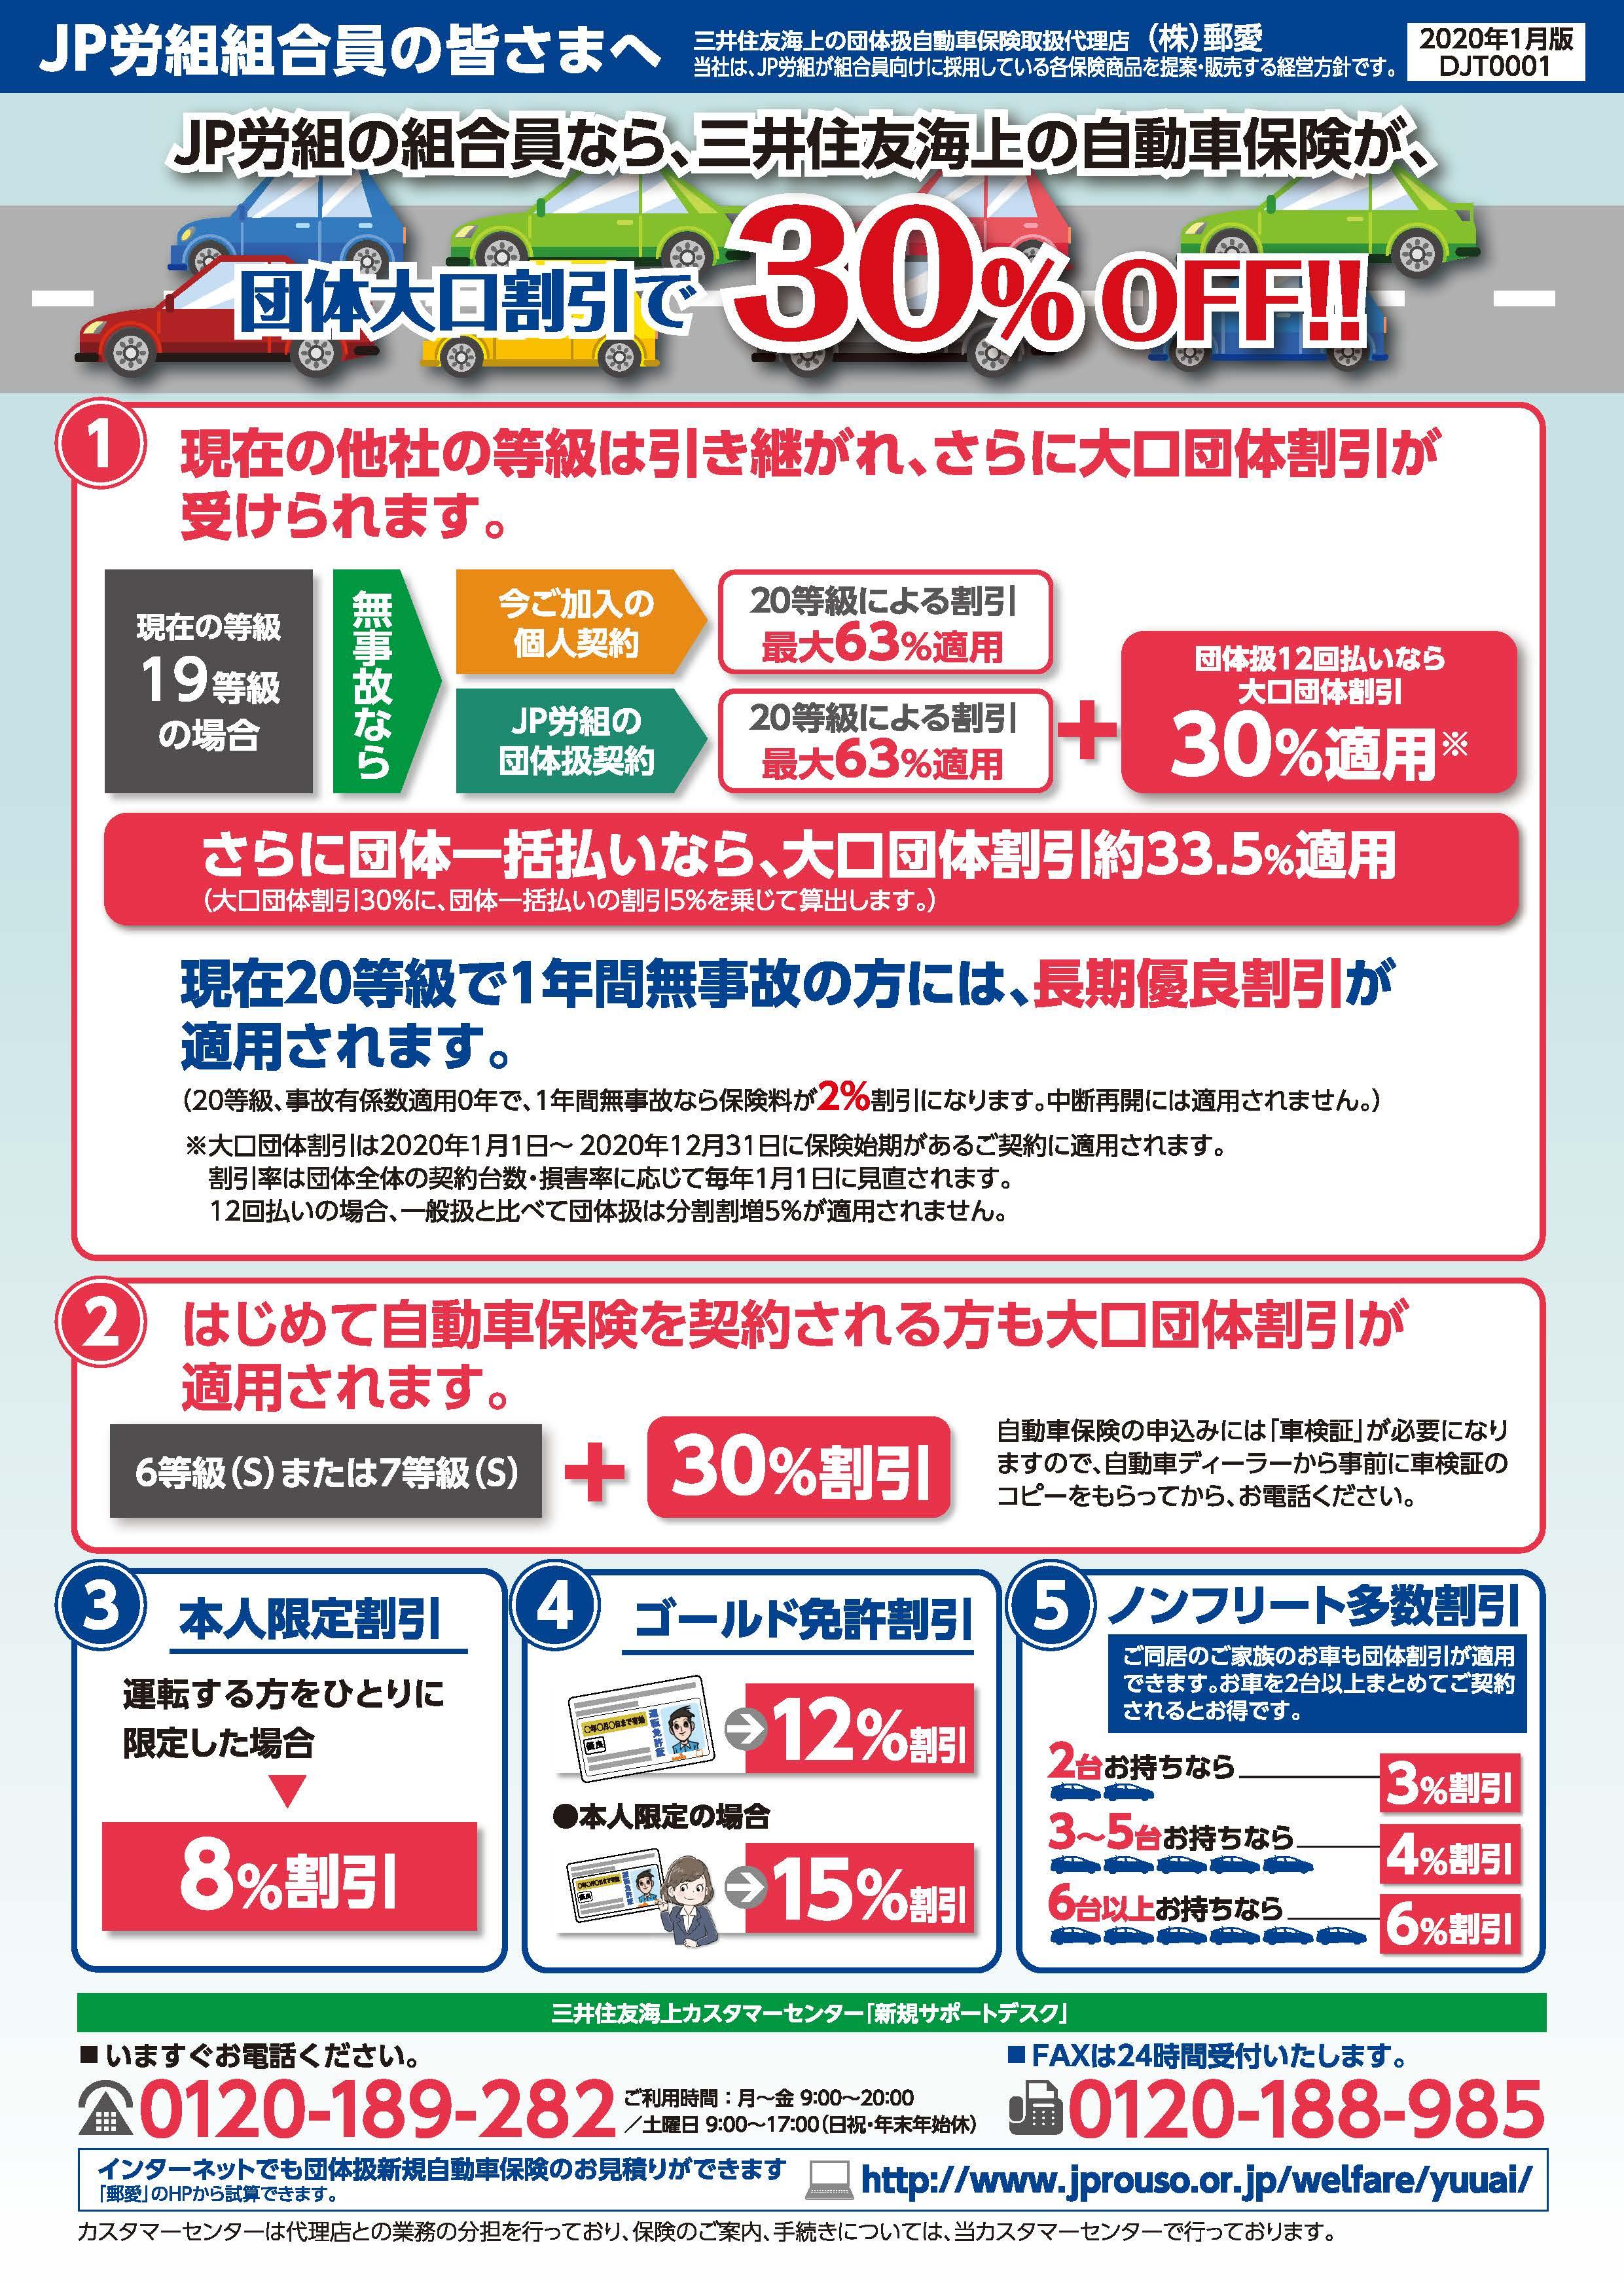 JP労組団体扱契約で三井住友海上の自動車保険が大口団体割引30%割引に!